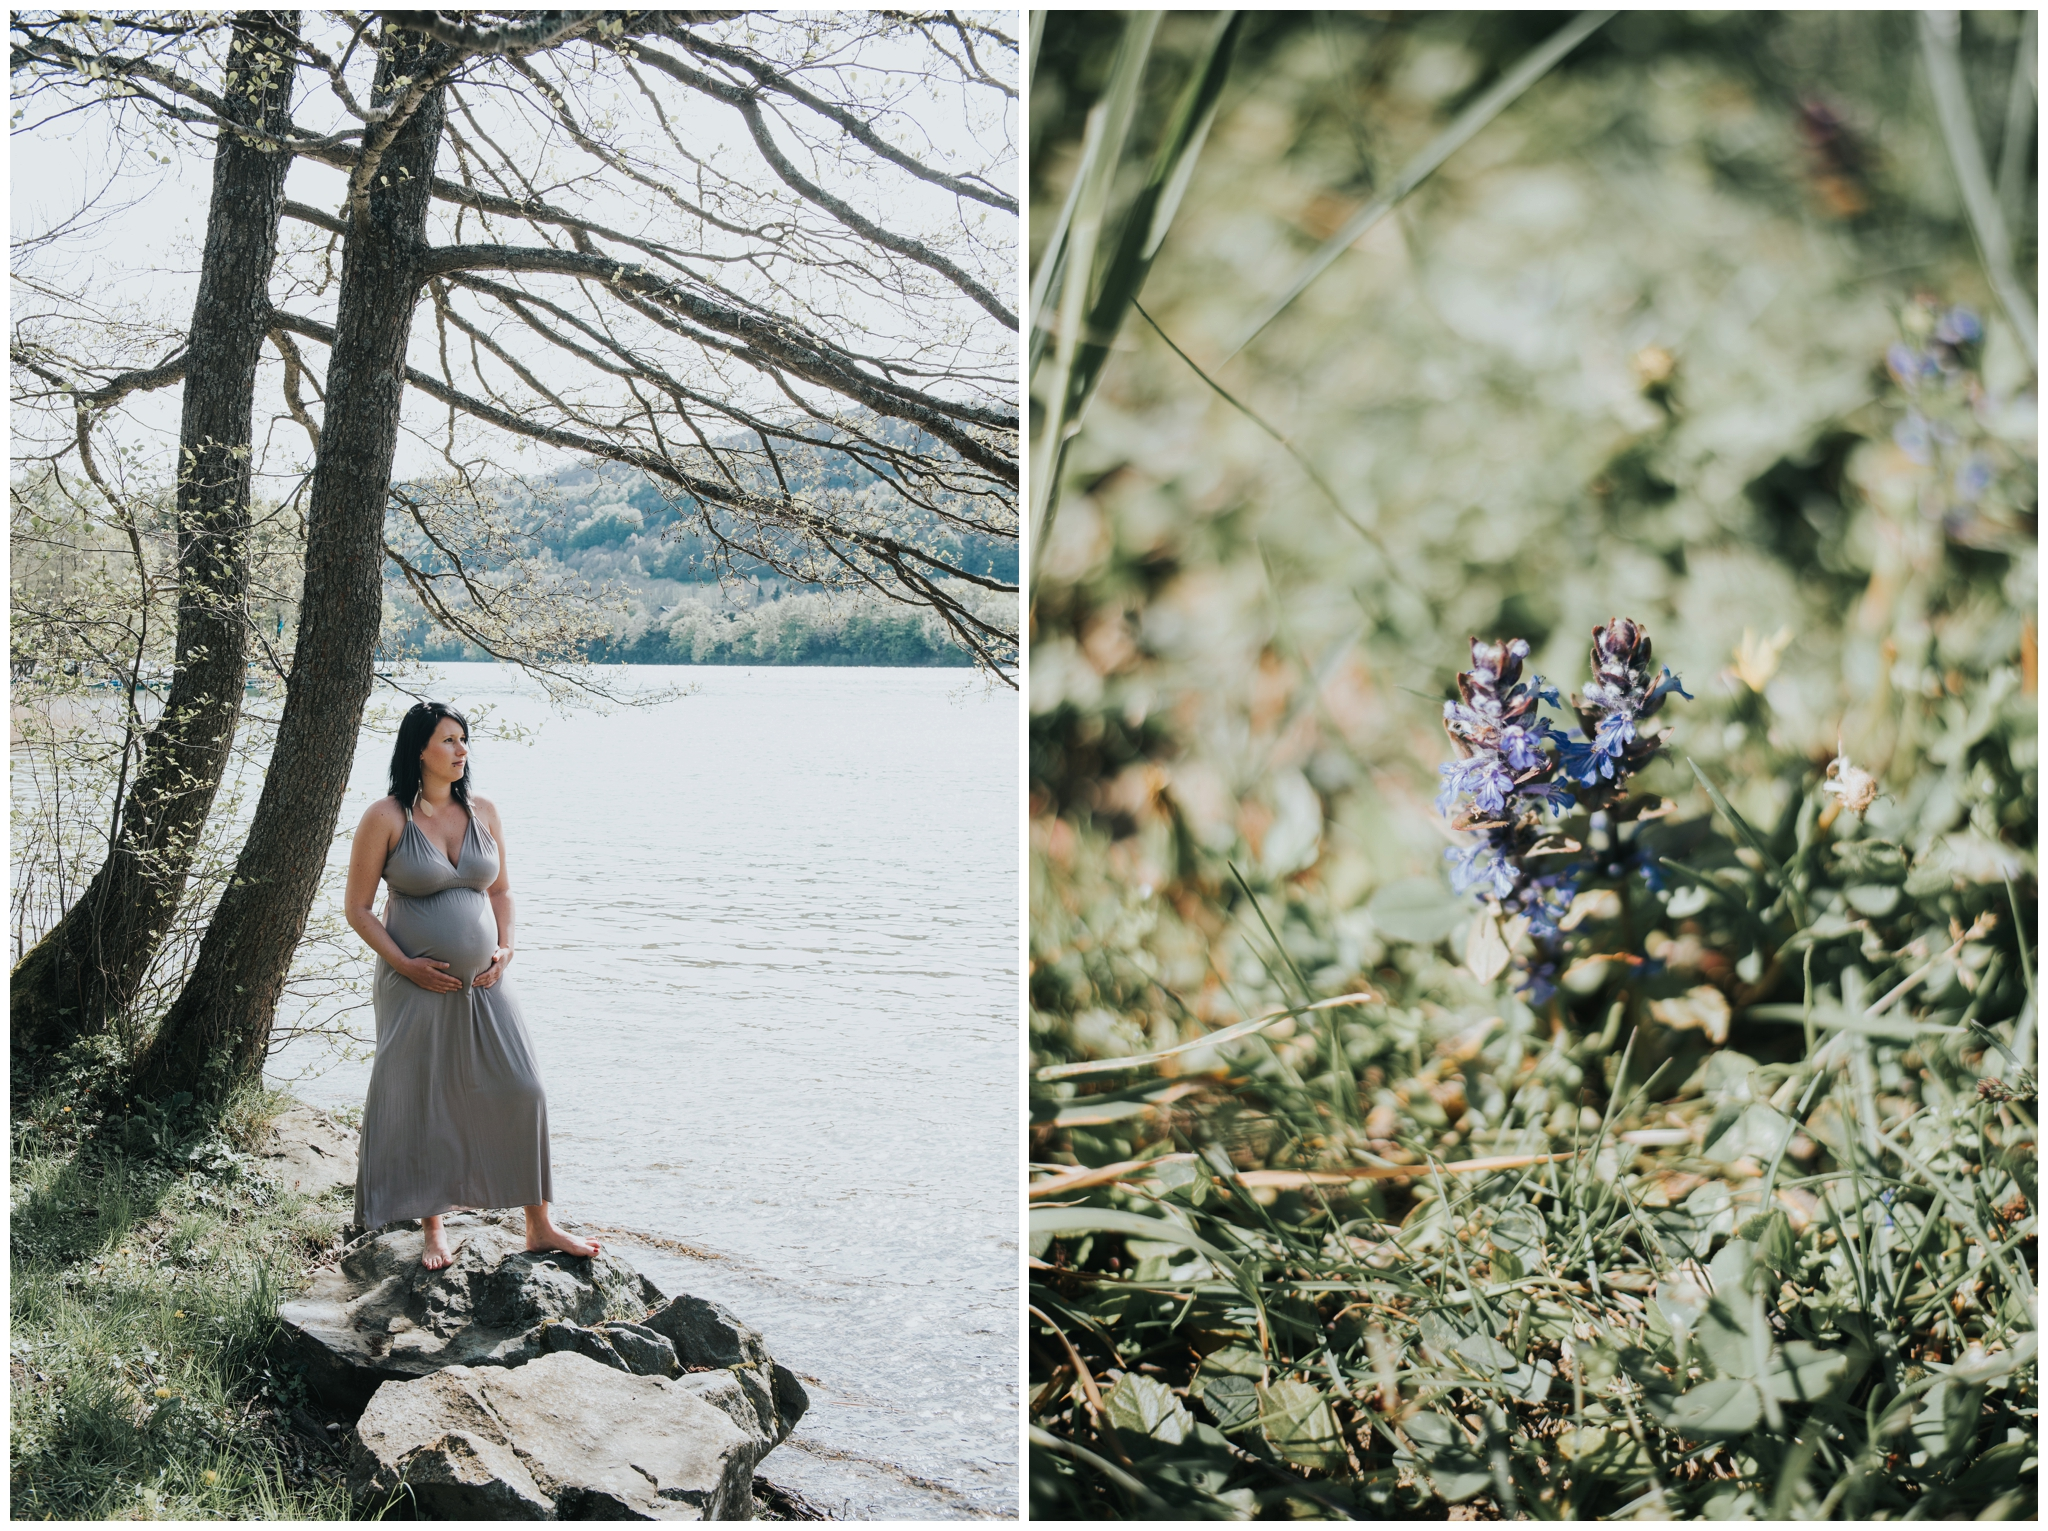 photographe grossesse future maman grenoble annecy lyon naturel lifestyle lac nouveau ne maternite famille seance photo famille _008